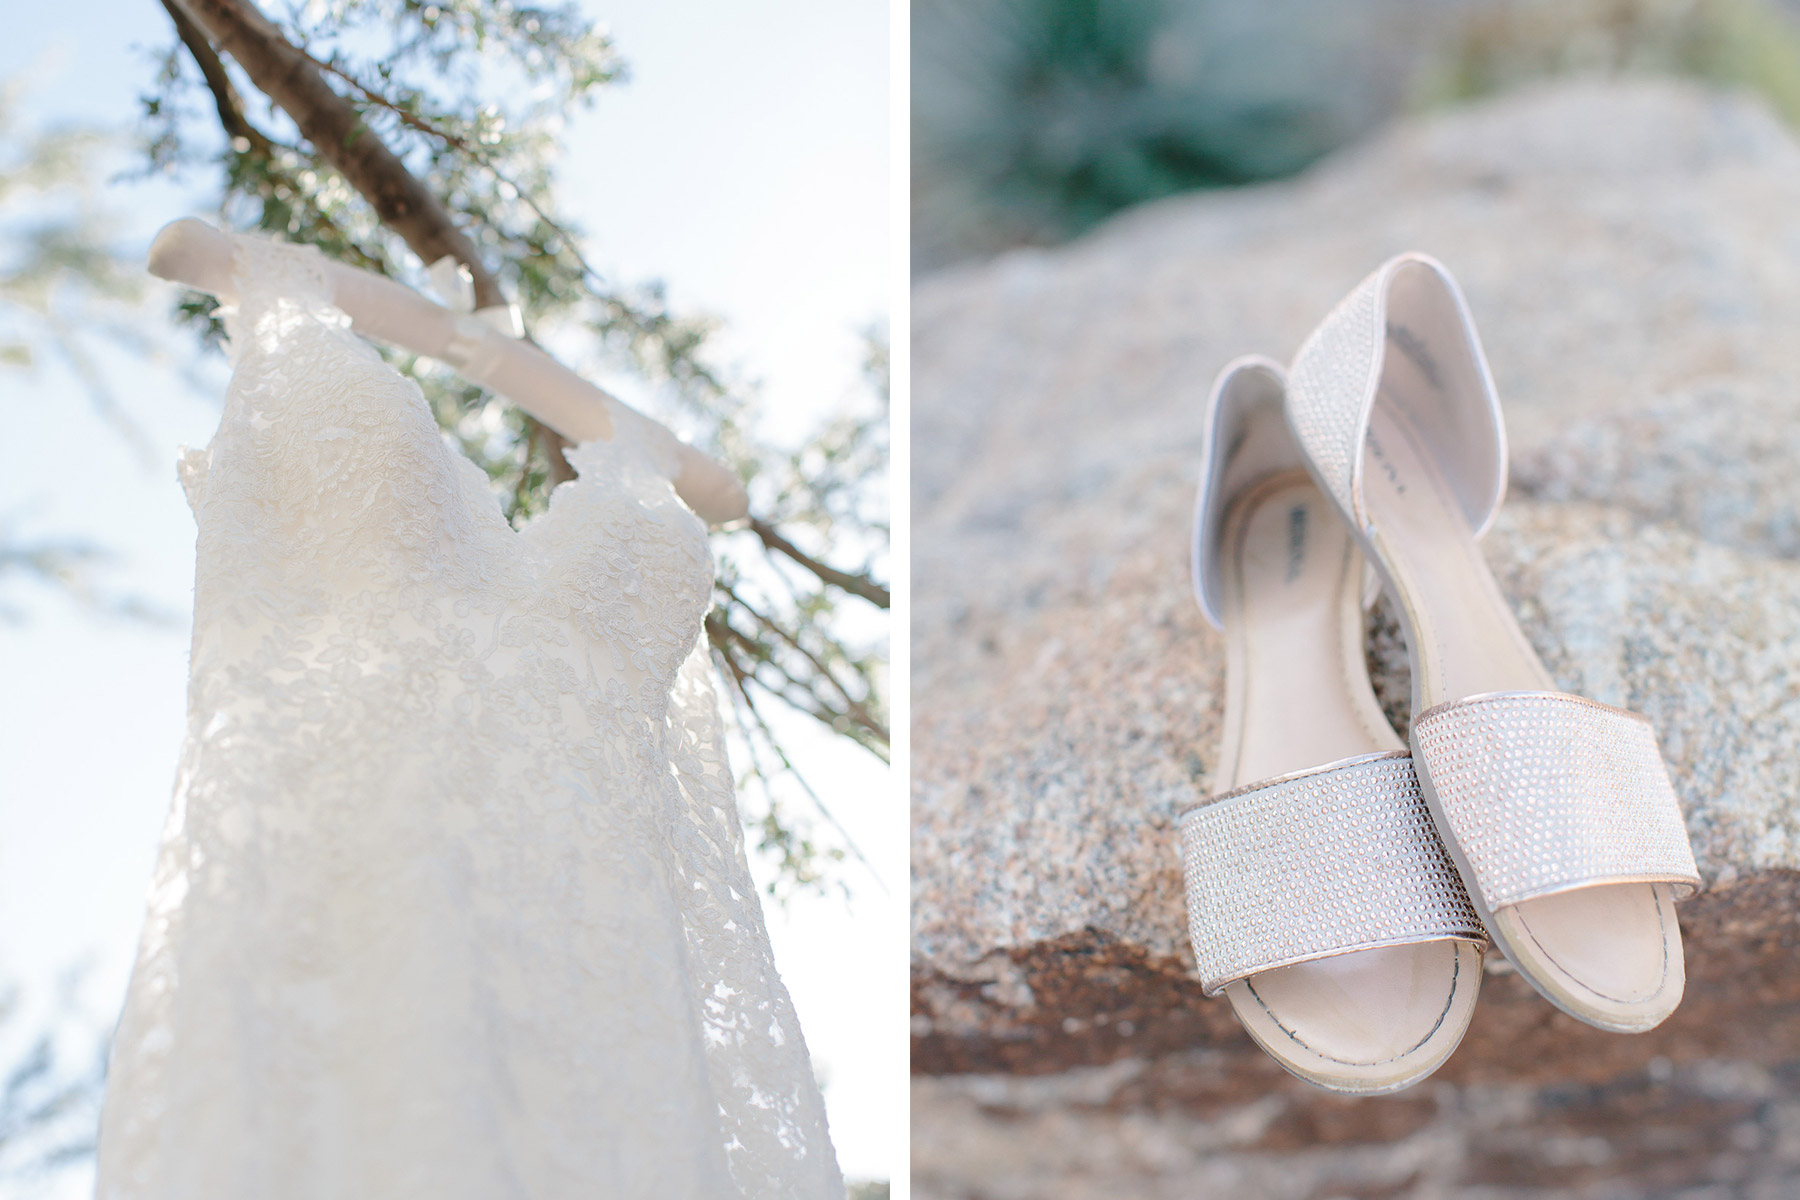 161210-Luxium-Weddings-Arizona-Matt-Jenny-Anthem-Golf-Country-Club-1002a.jpg